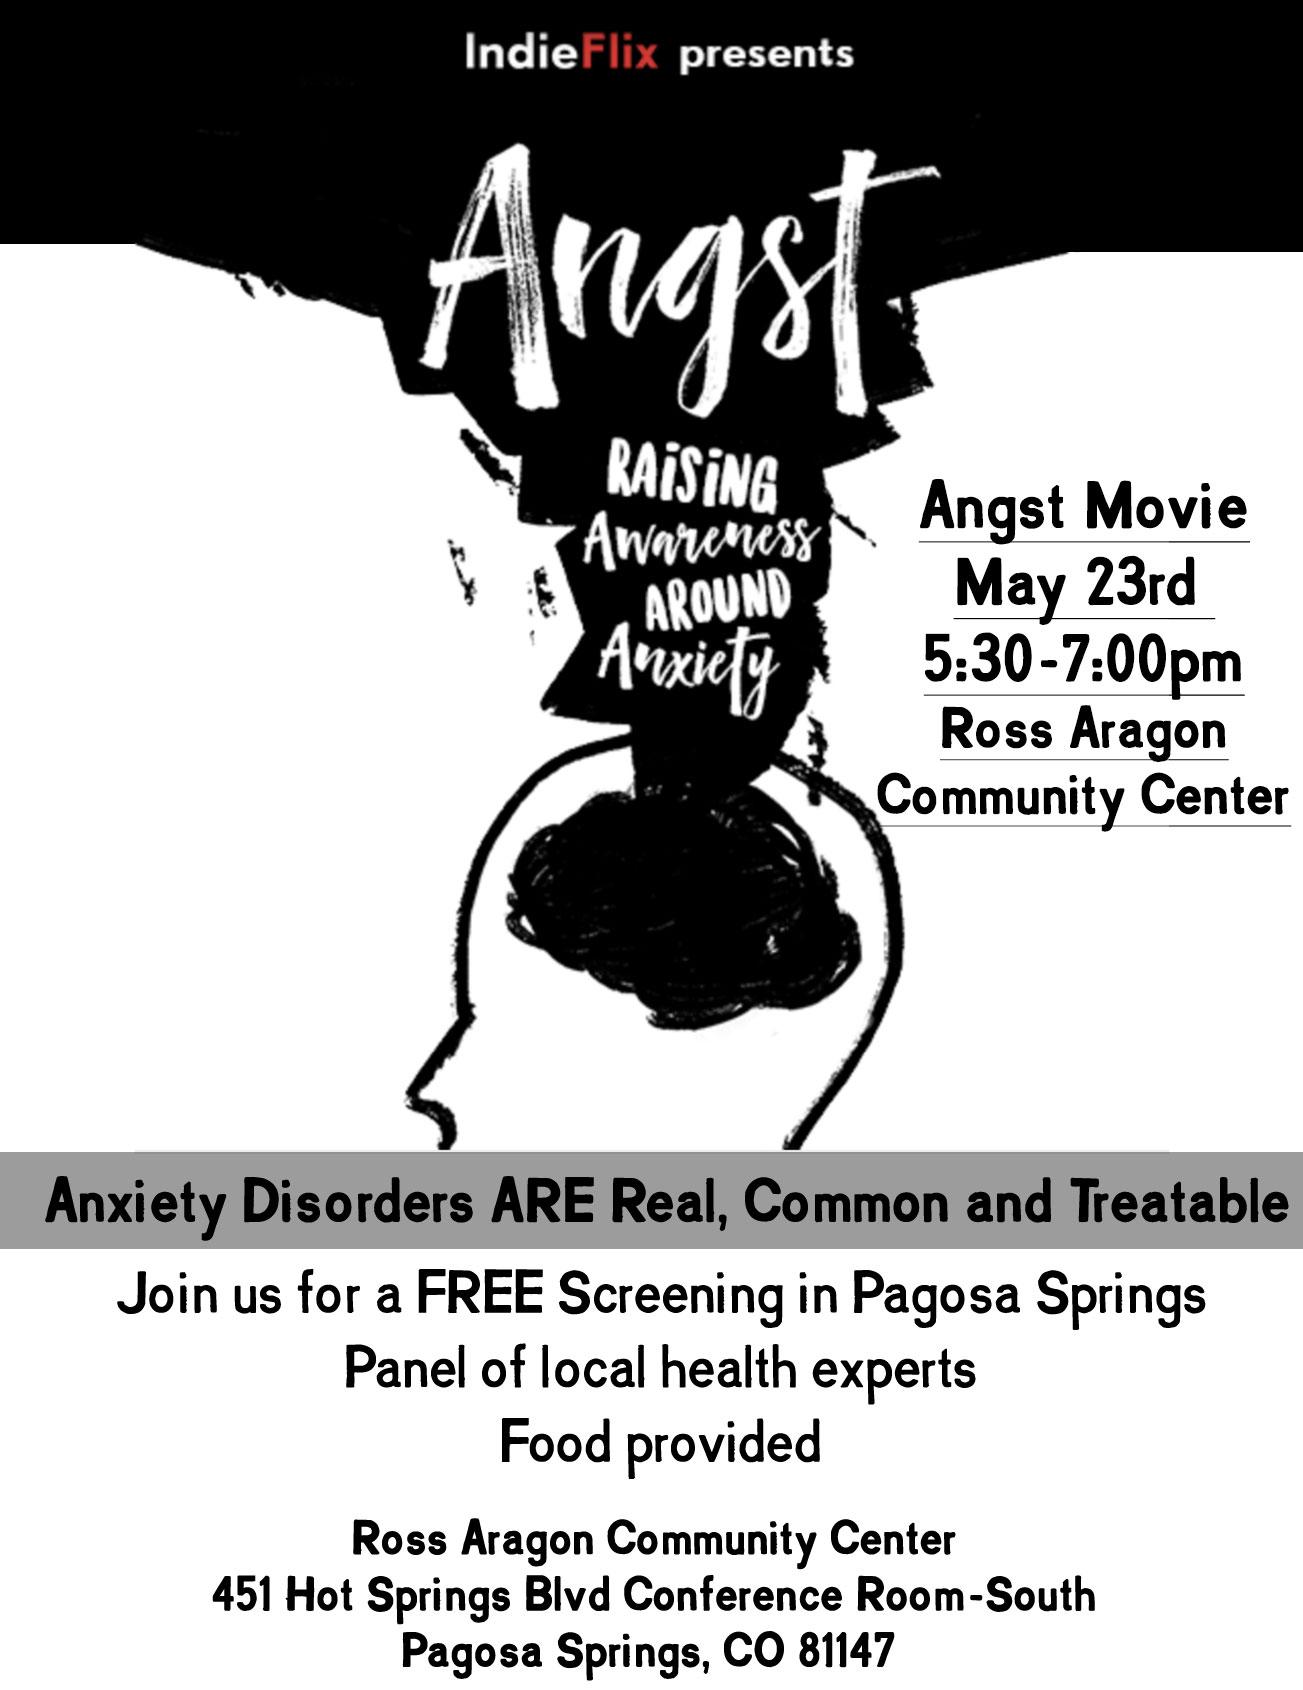 Angst-movie-flyer-(VS2)